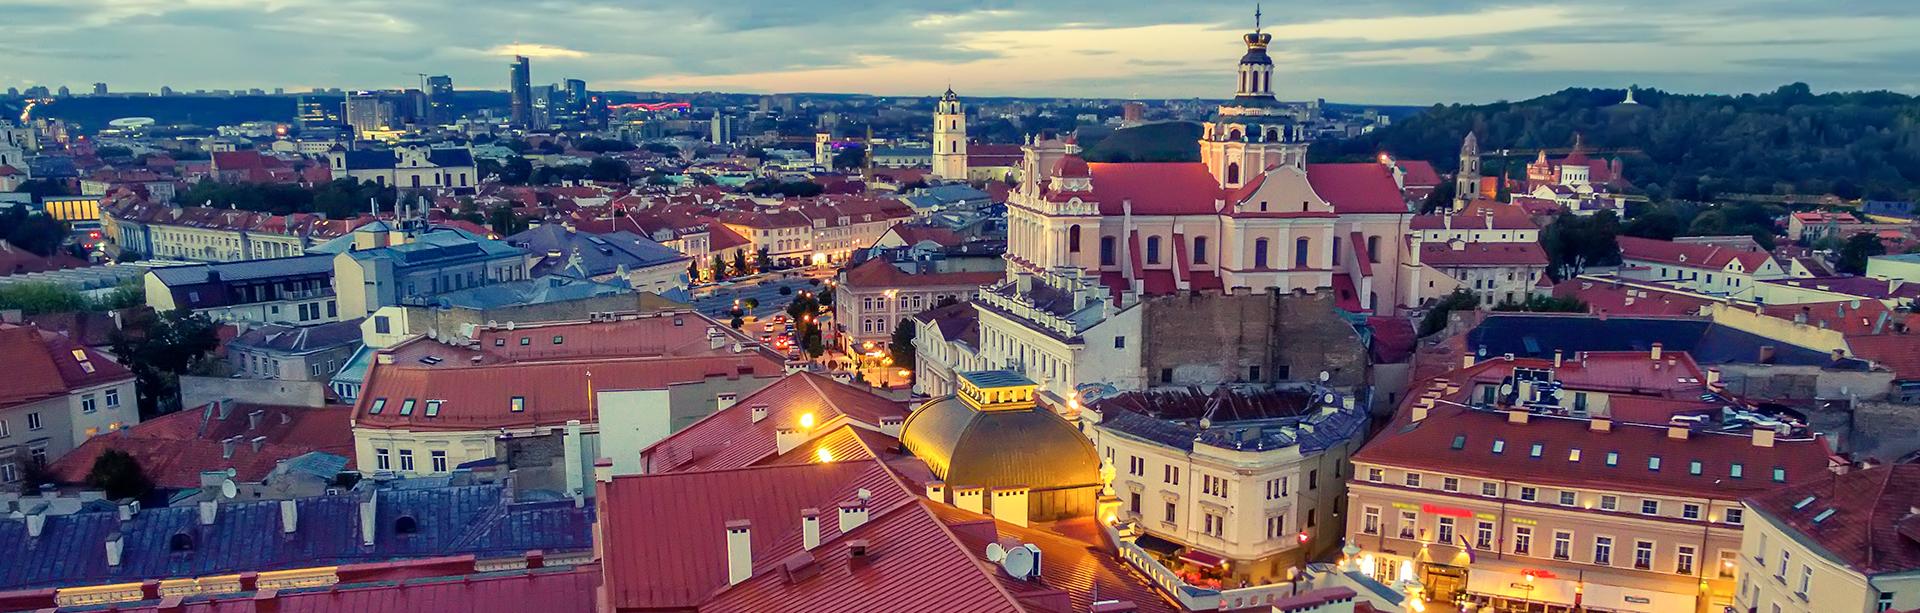 Vilnius_1